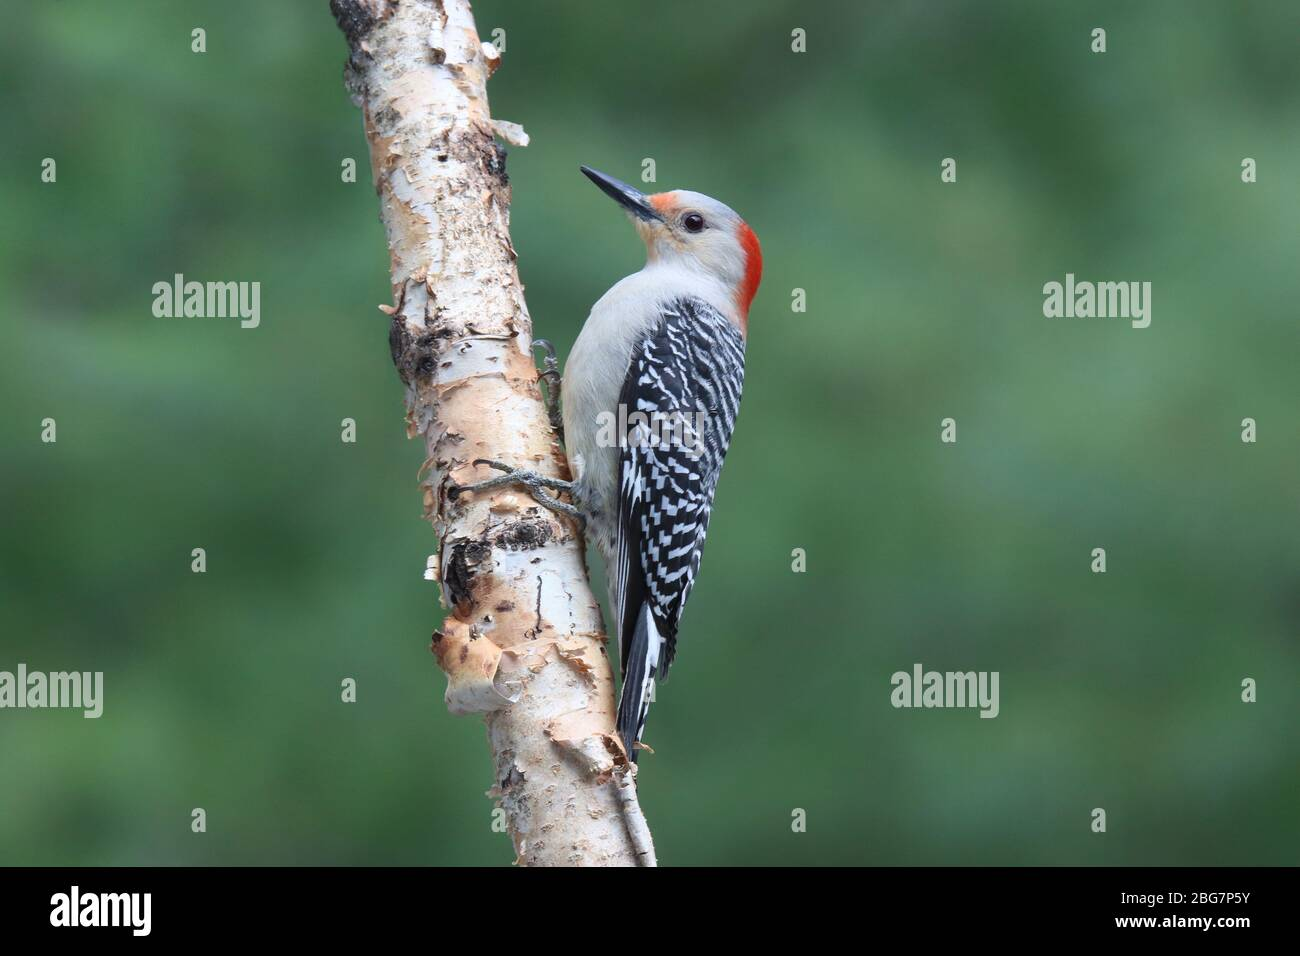 Female Red Bellied Woodpecker Melanerpes carolinus perching on a birch branch Stock Photo